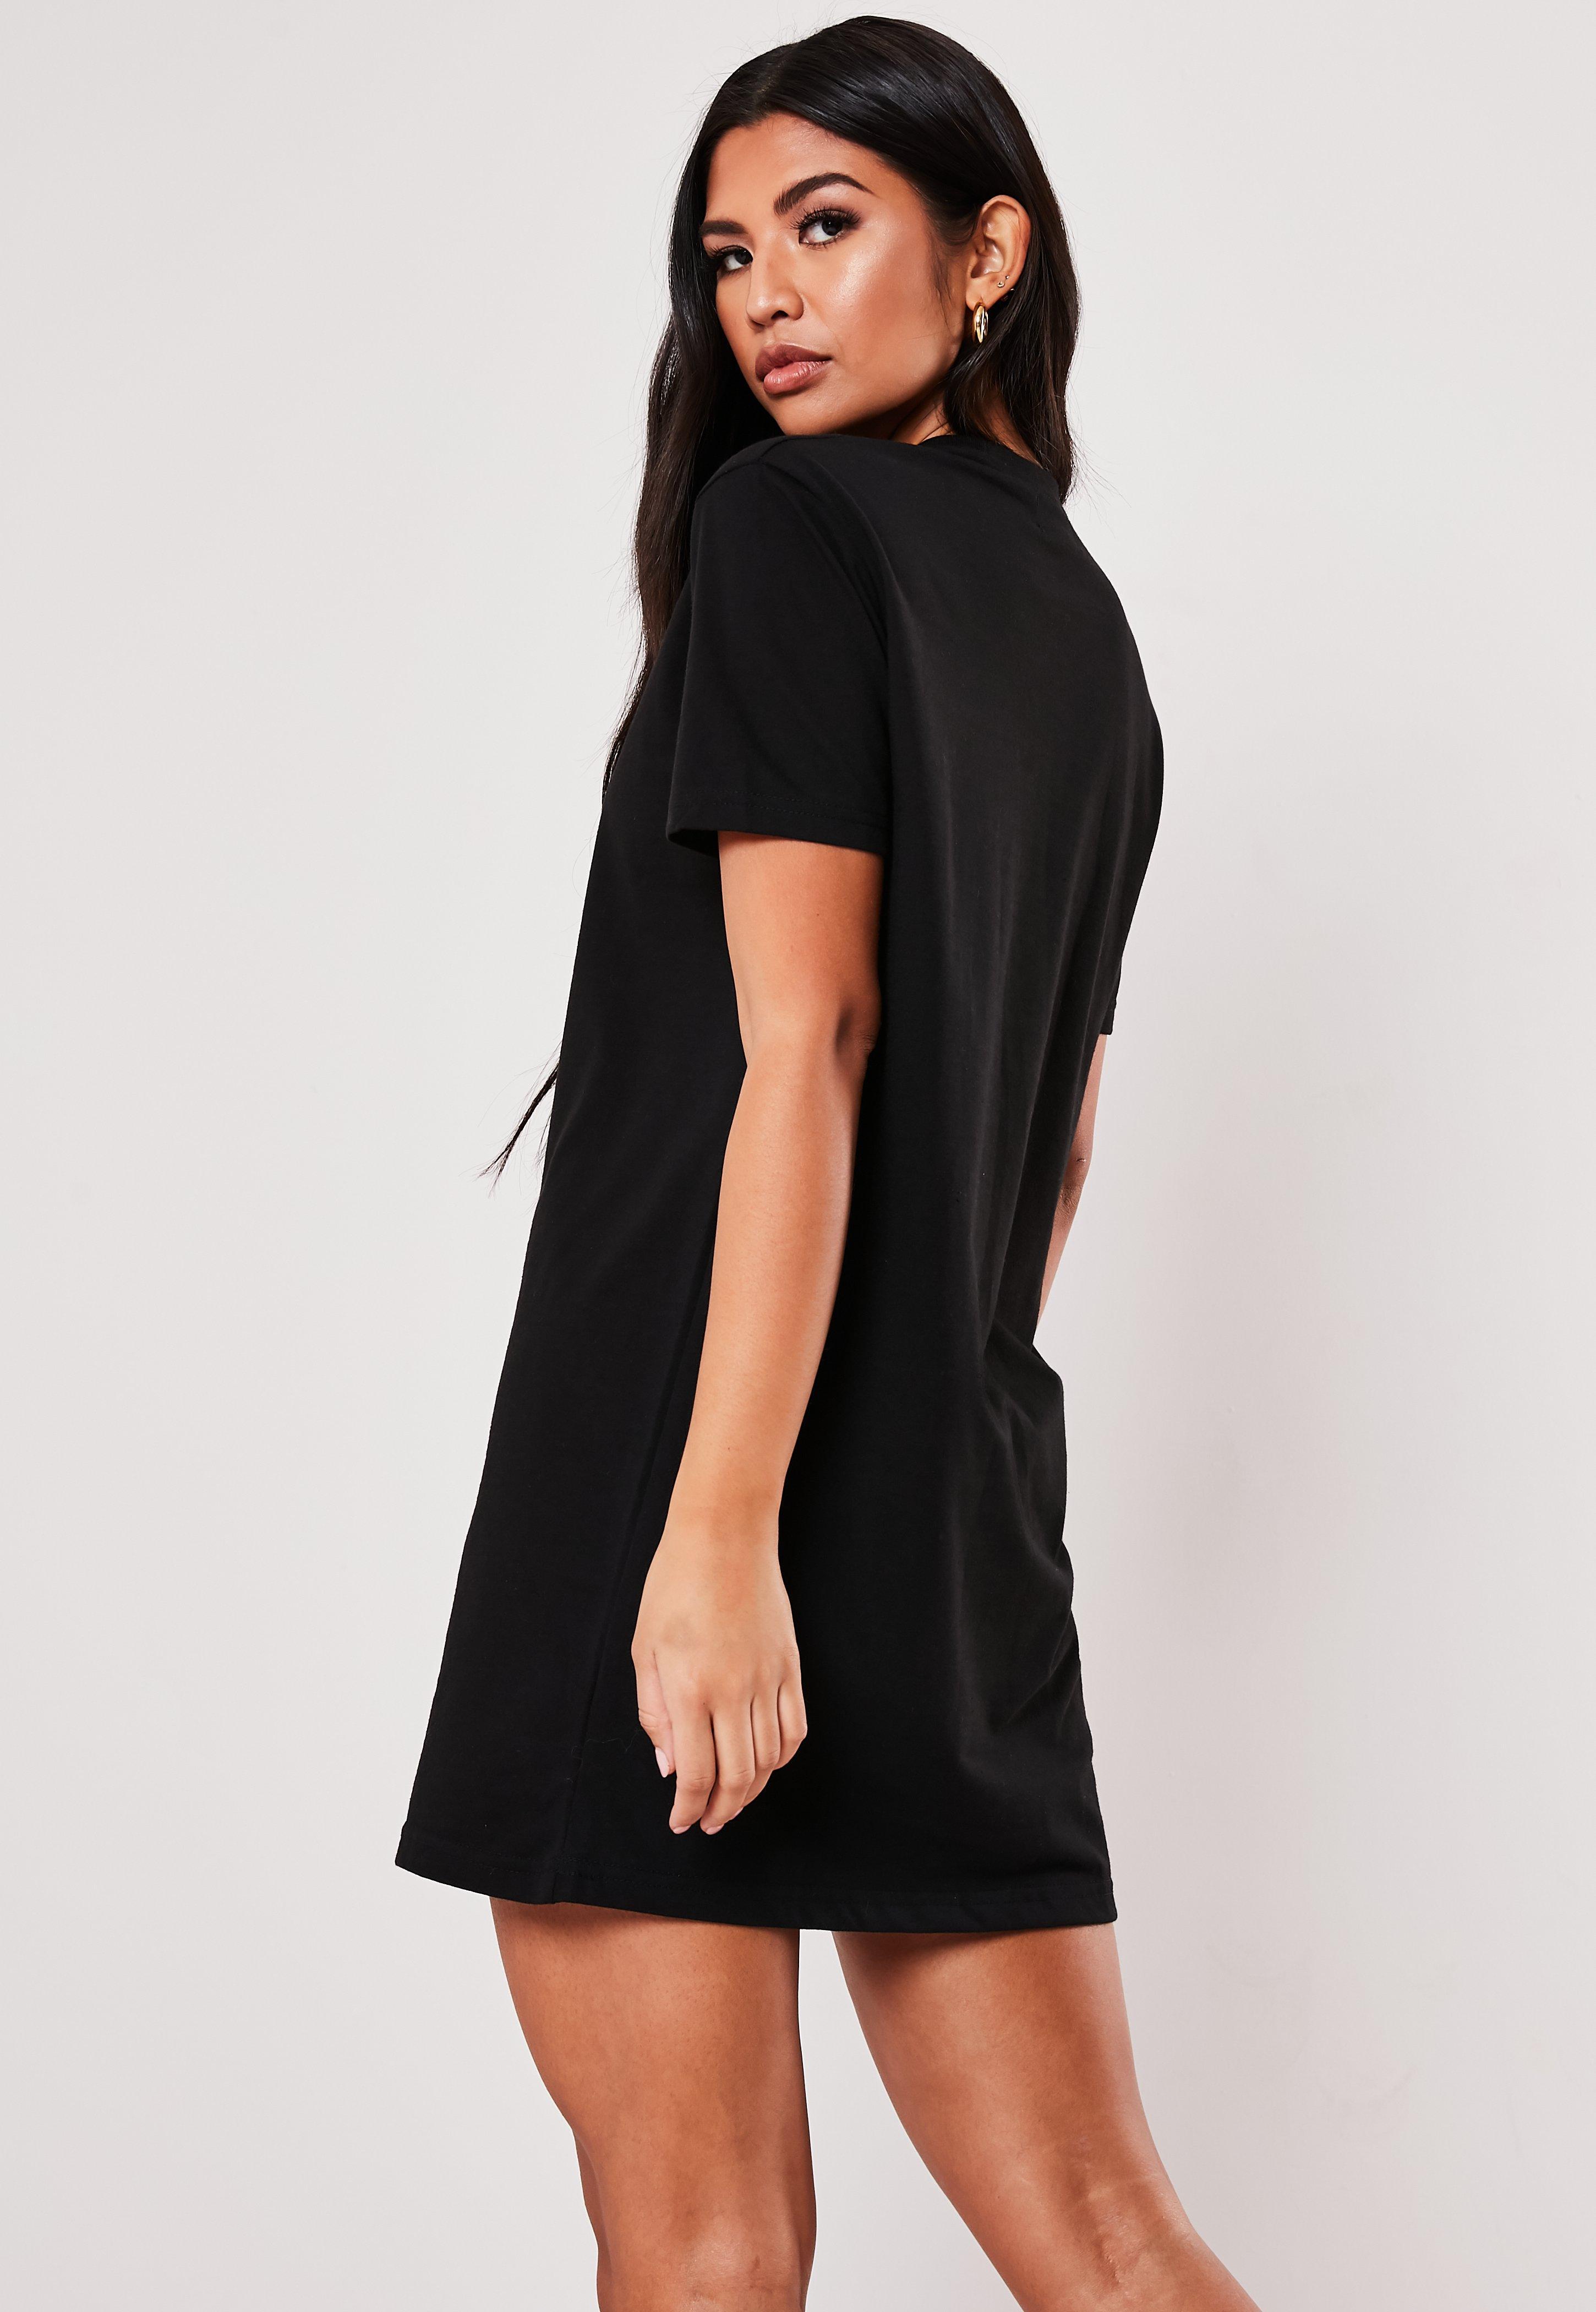 black t shirt dress